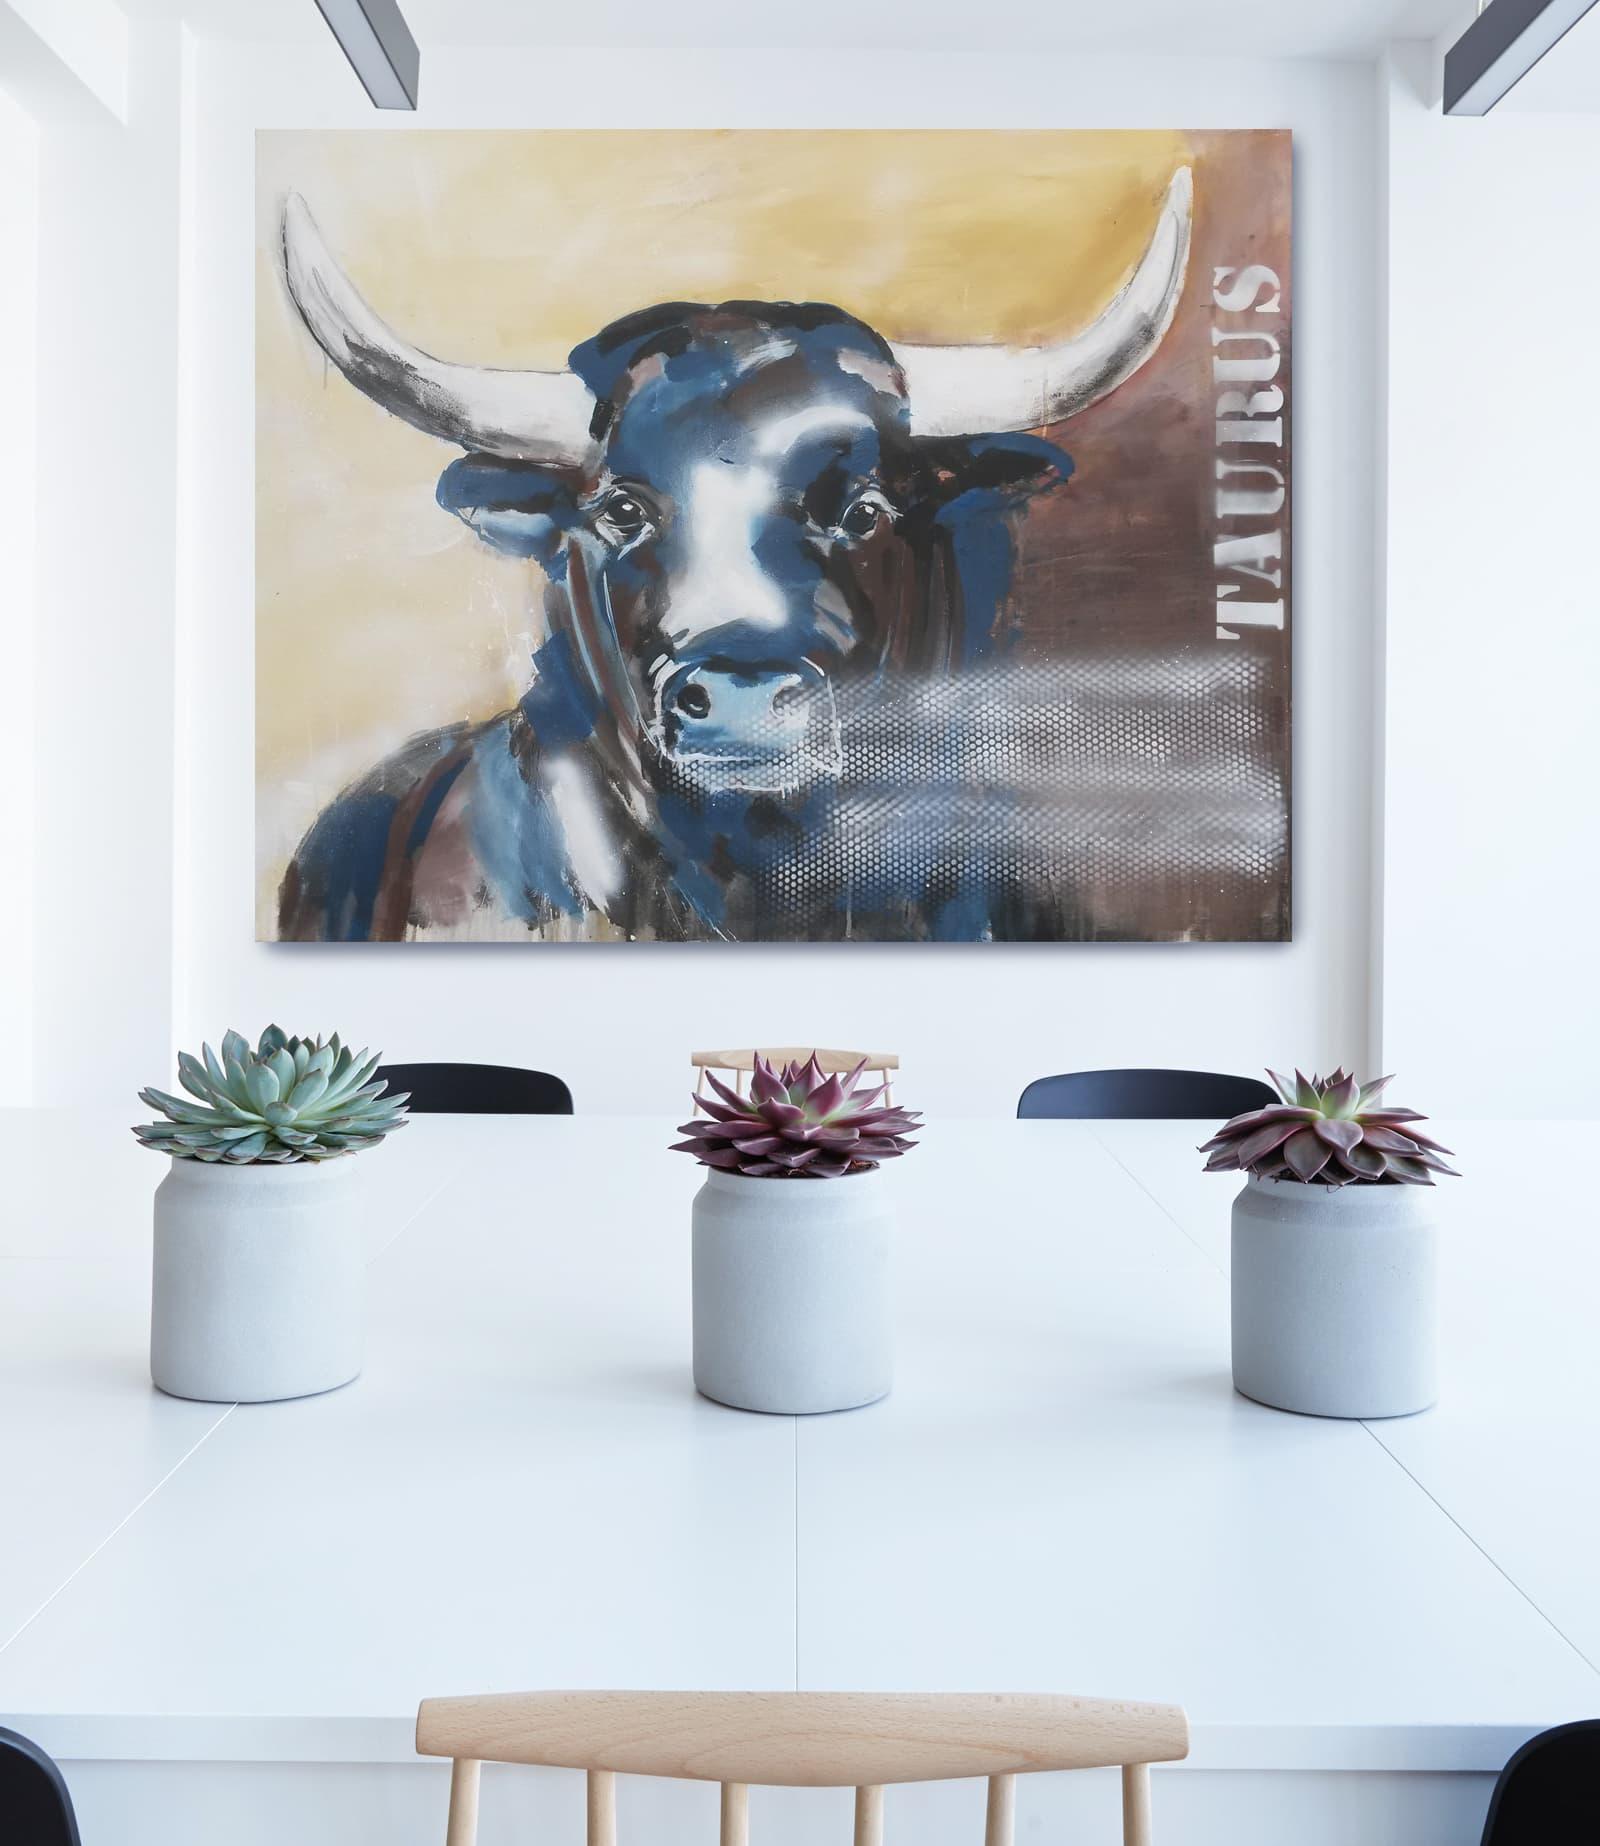 taurus 2 unikat auf leinwand stier gem lde atelier stefanie rogge. Black Bedroom Furniture Sets. Home Design Ideas